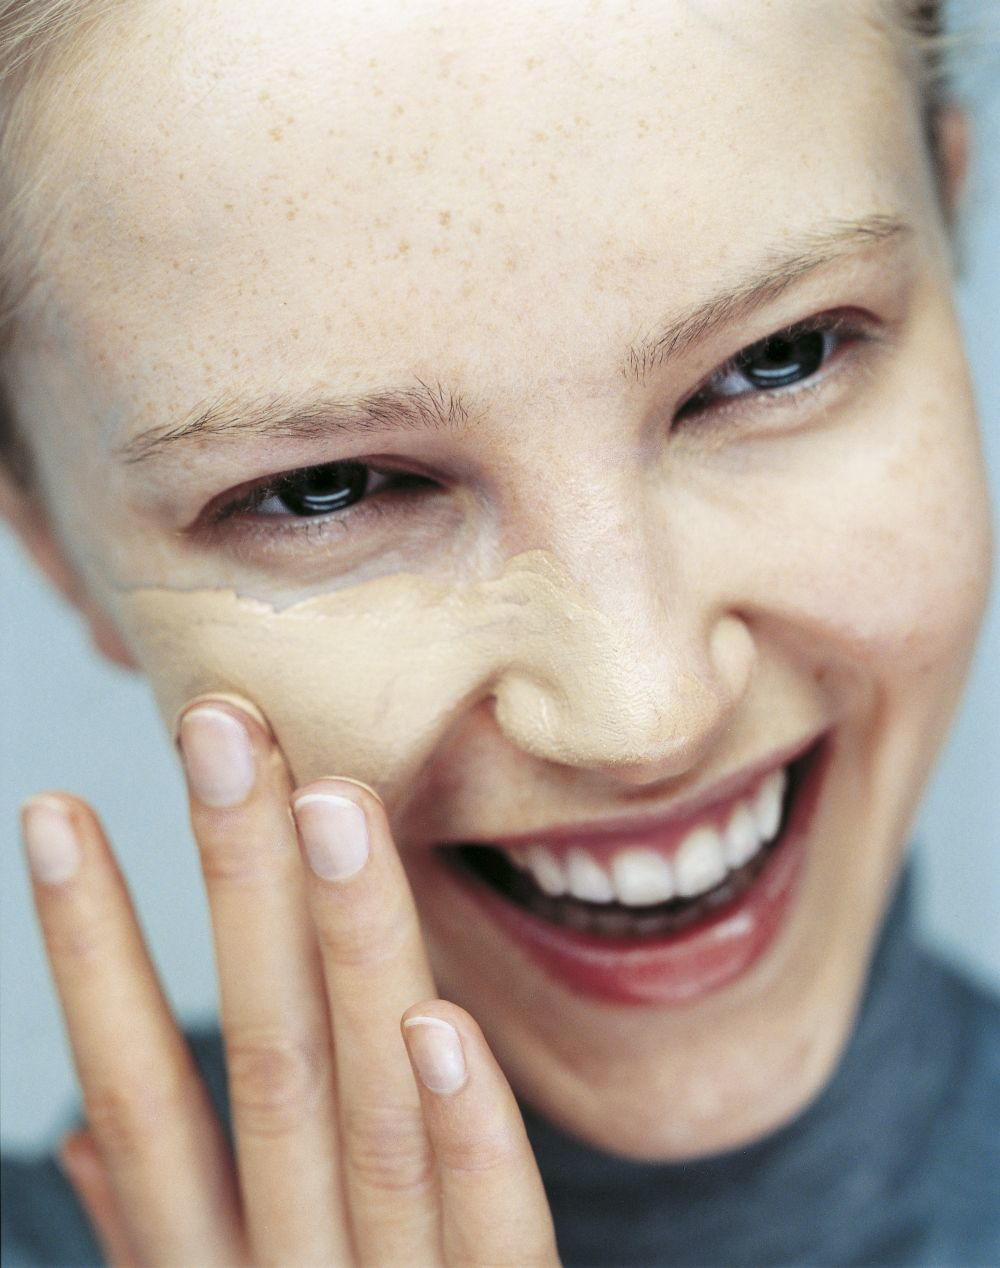 Elige tu base de maquillaje según tu tipo de piel.